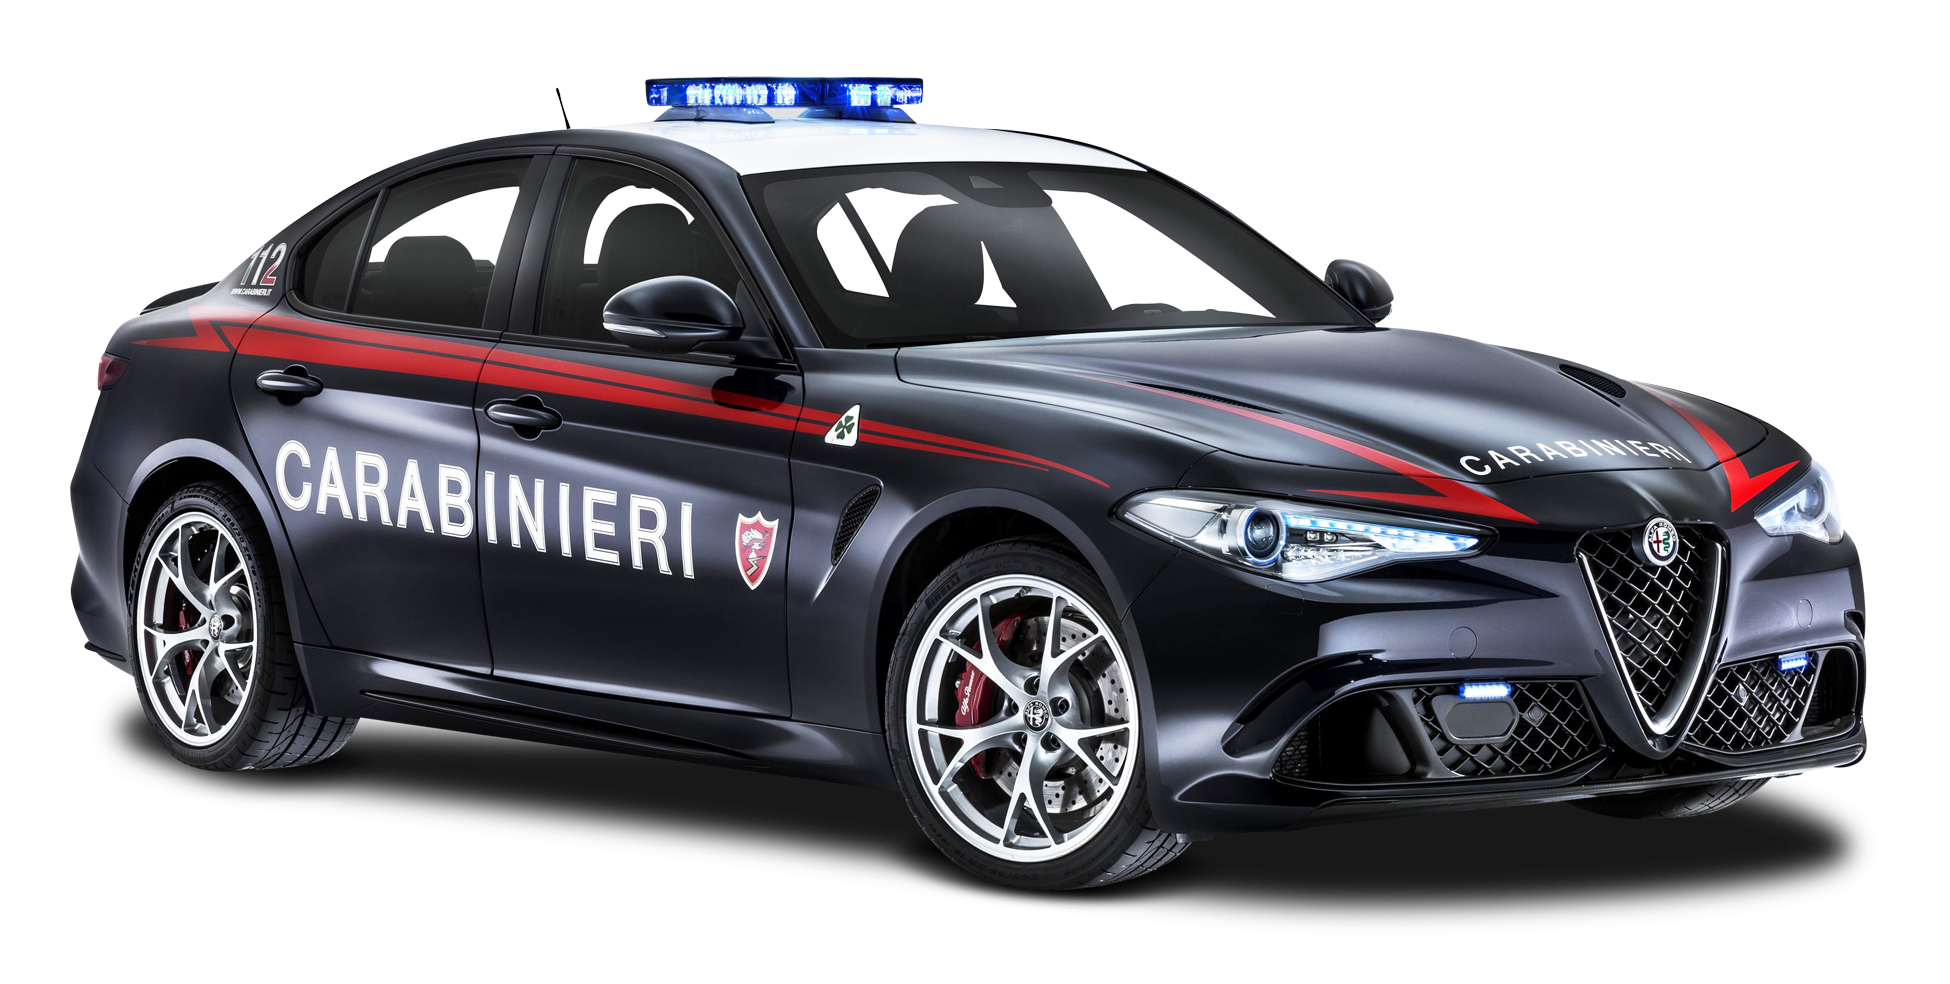 Alfa Romeo Police Car Png Image Alfa Romeo Police Cars Jaguar Sport